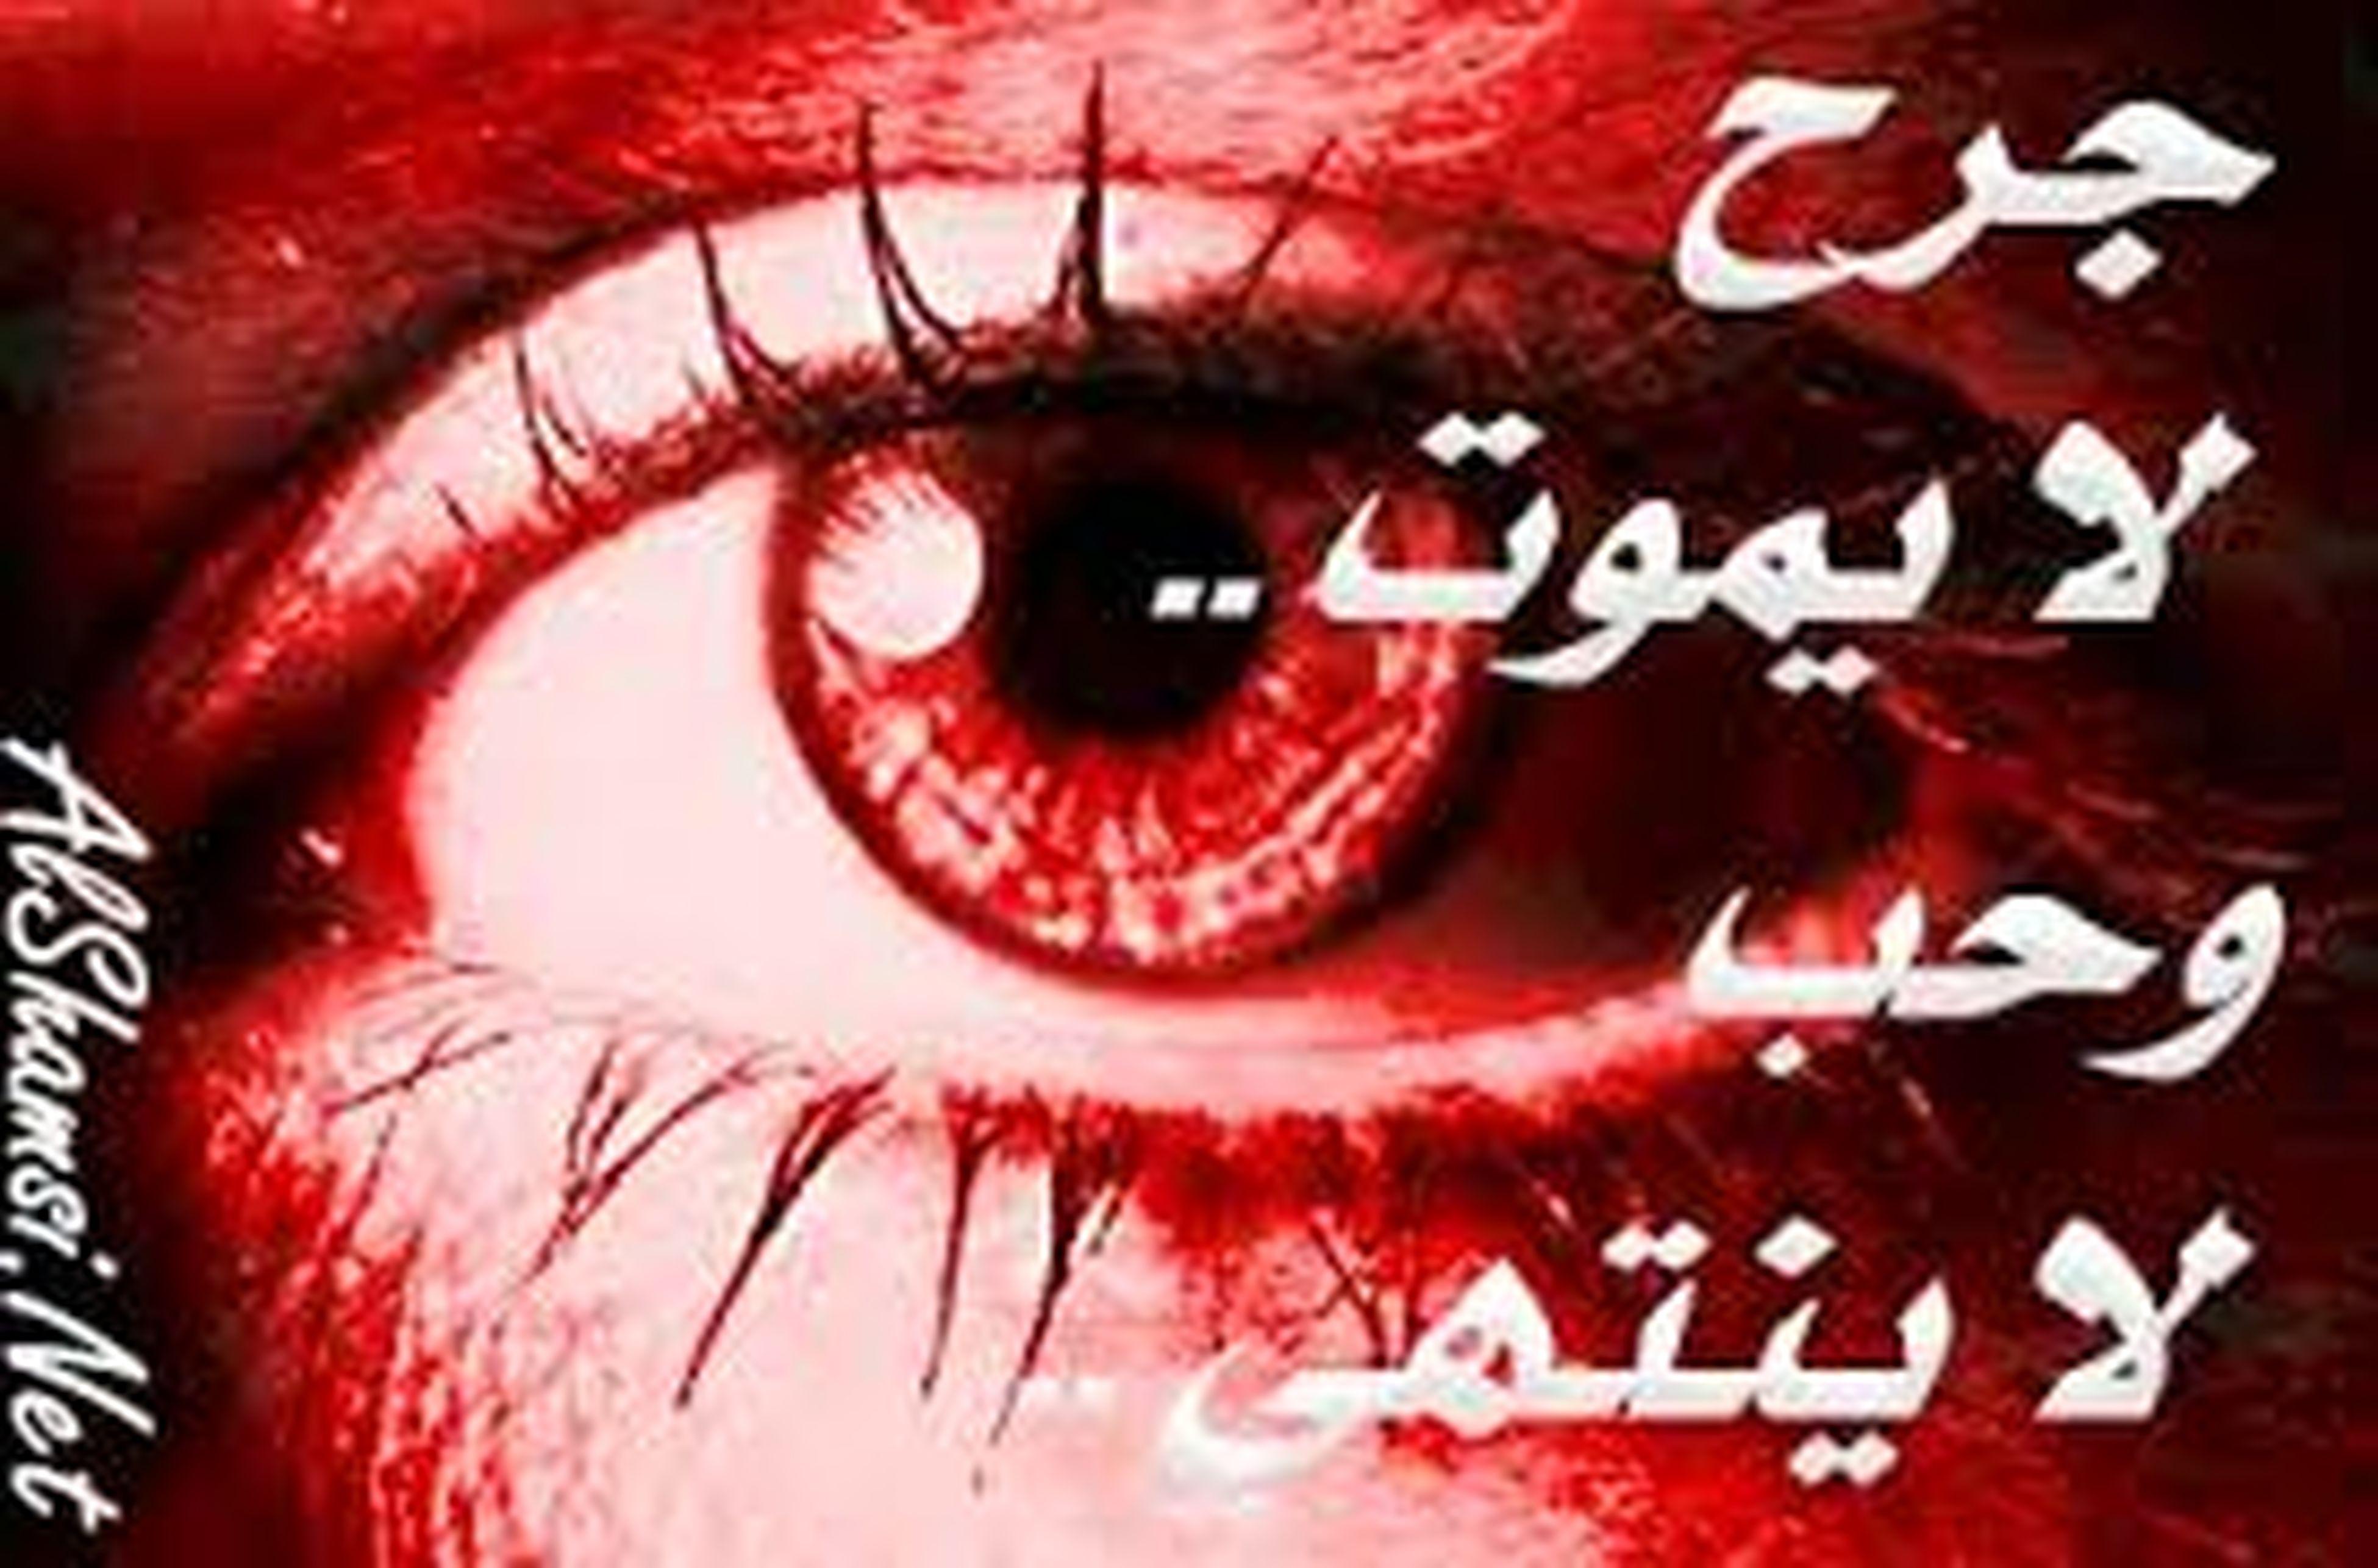 close-up, red, human eye, eyelash, indoors, extreme close-up, full frame, portrait, eyesight, human face, part of, backgrounds, looking at camera, detail, extreme close up, sensory perception, vision